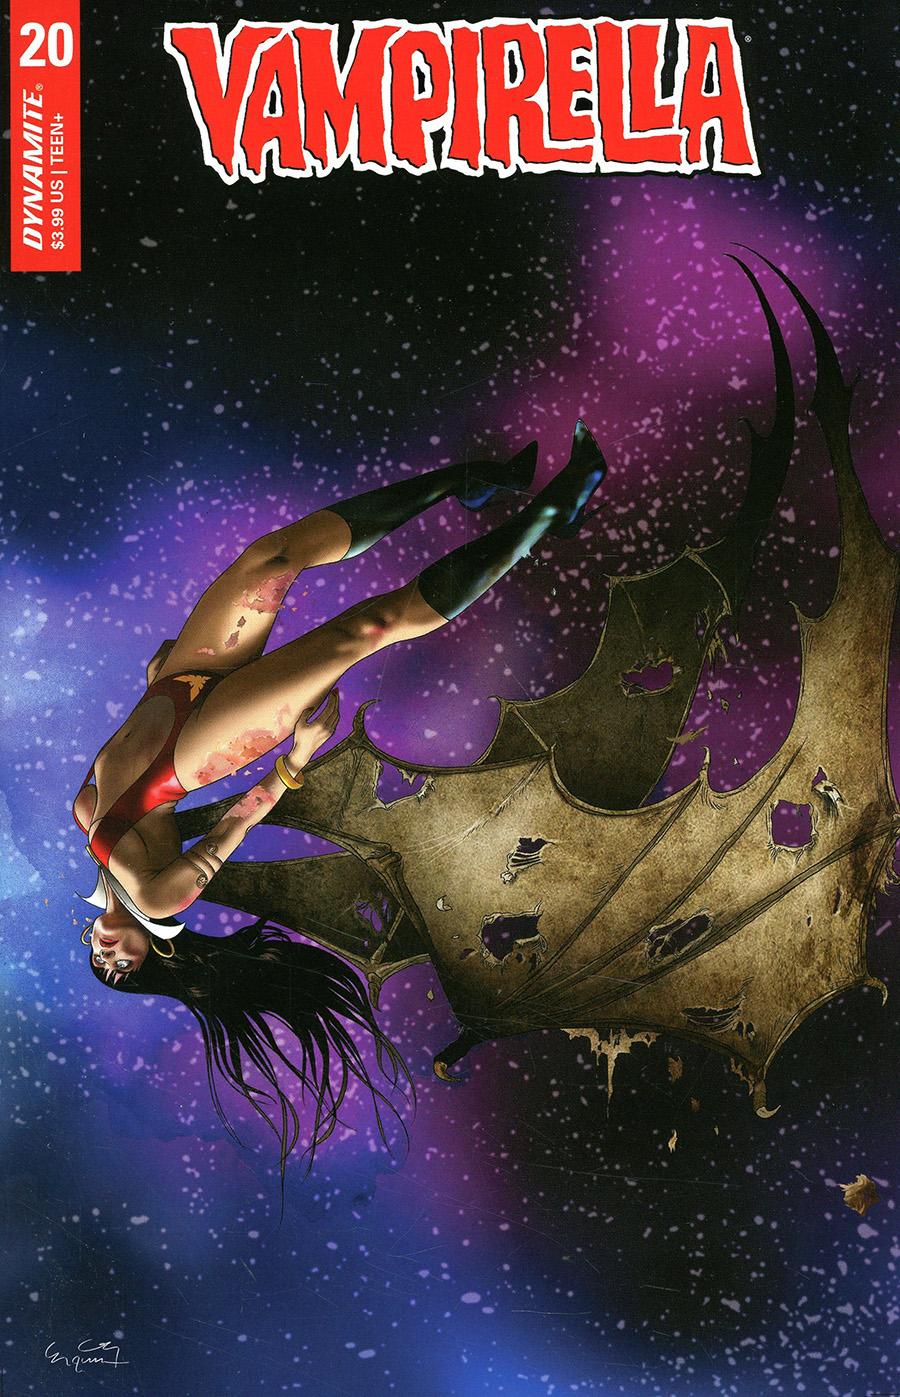 Vampirella Vol 8 #20 Cover D Variant Ergun Gunduz Cover